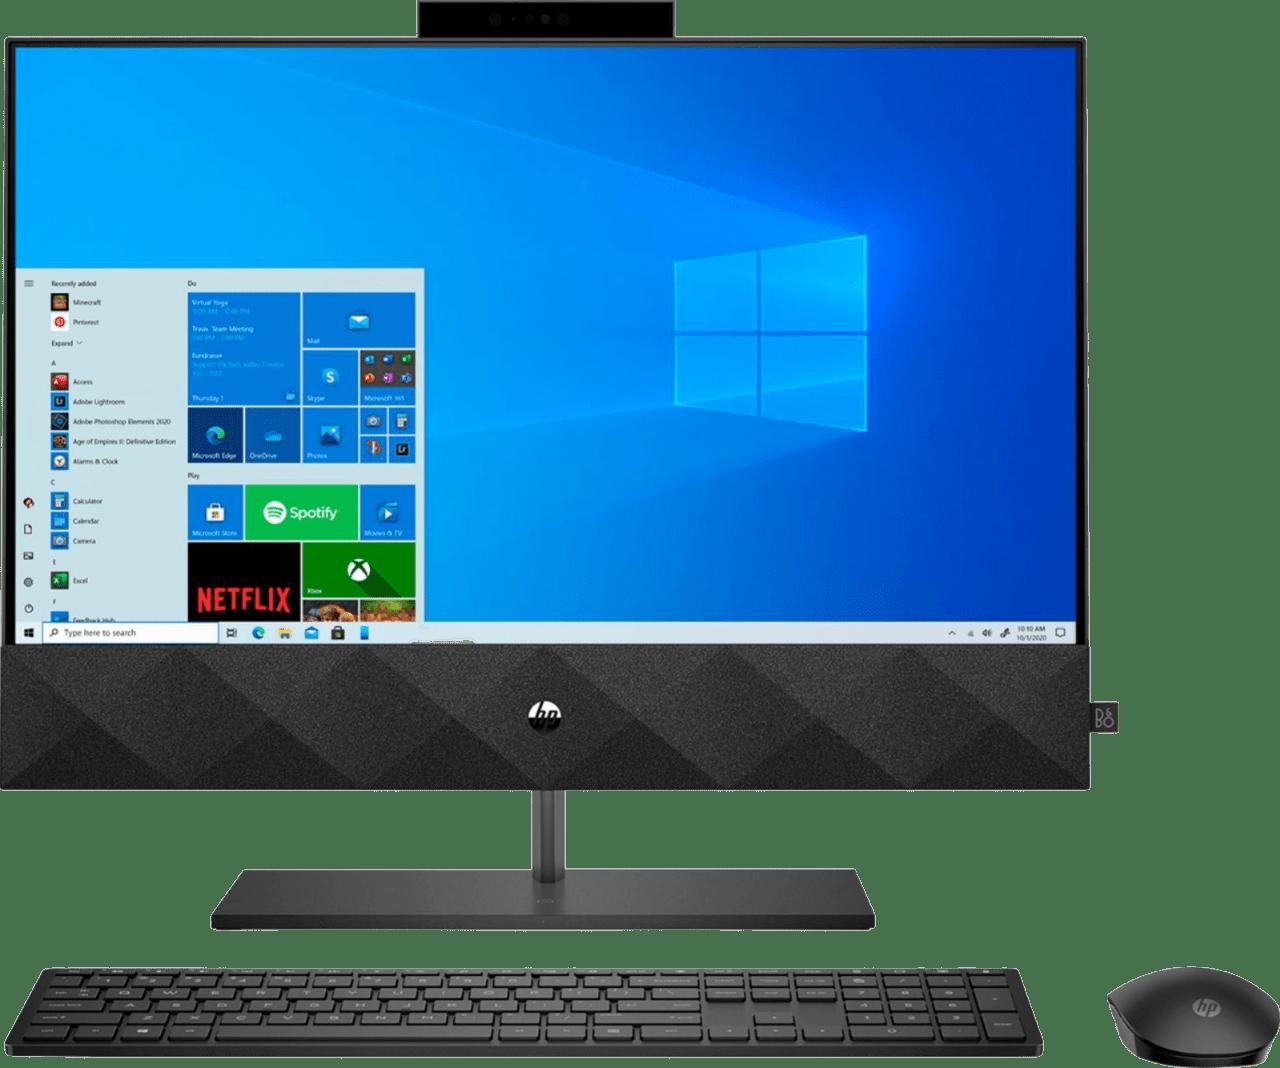 Black HP Pavilion All-In-One - Intel Core i5 - 12GB - 1TB SSD.1